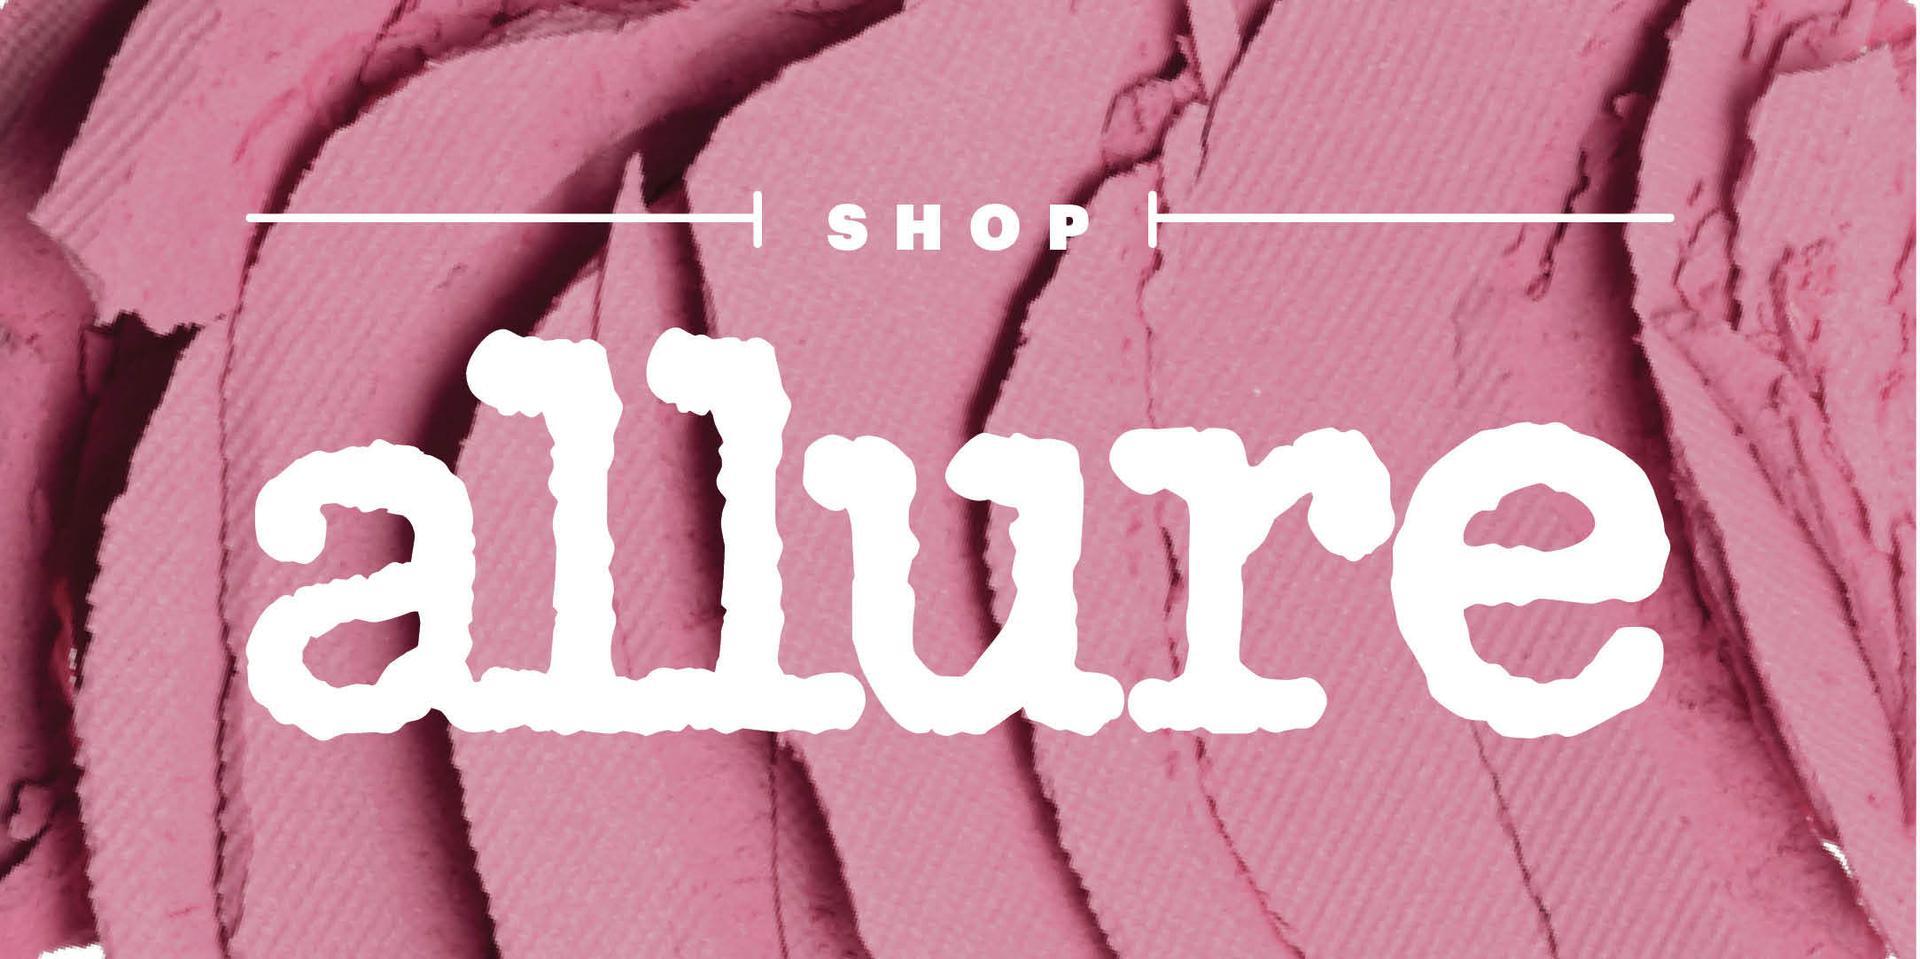 Shop Allure logo image